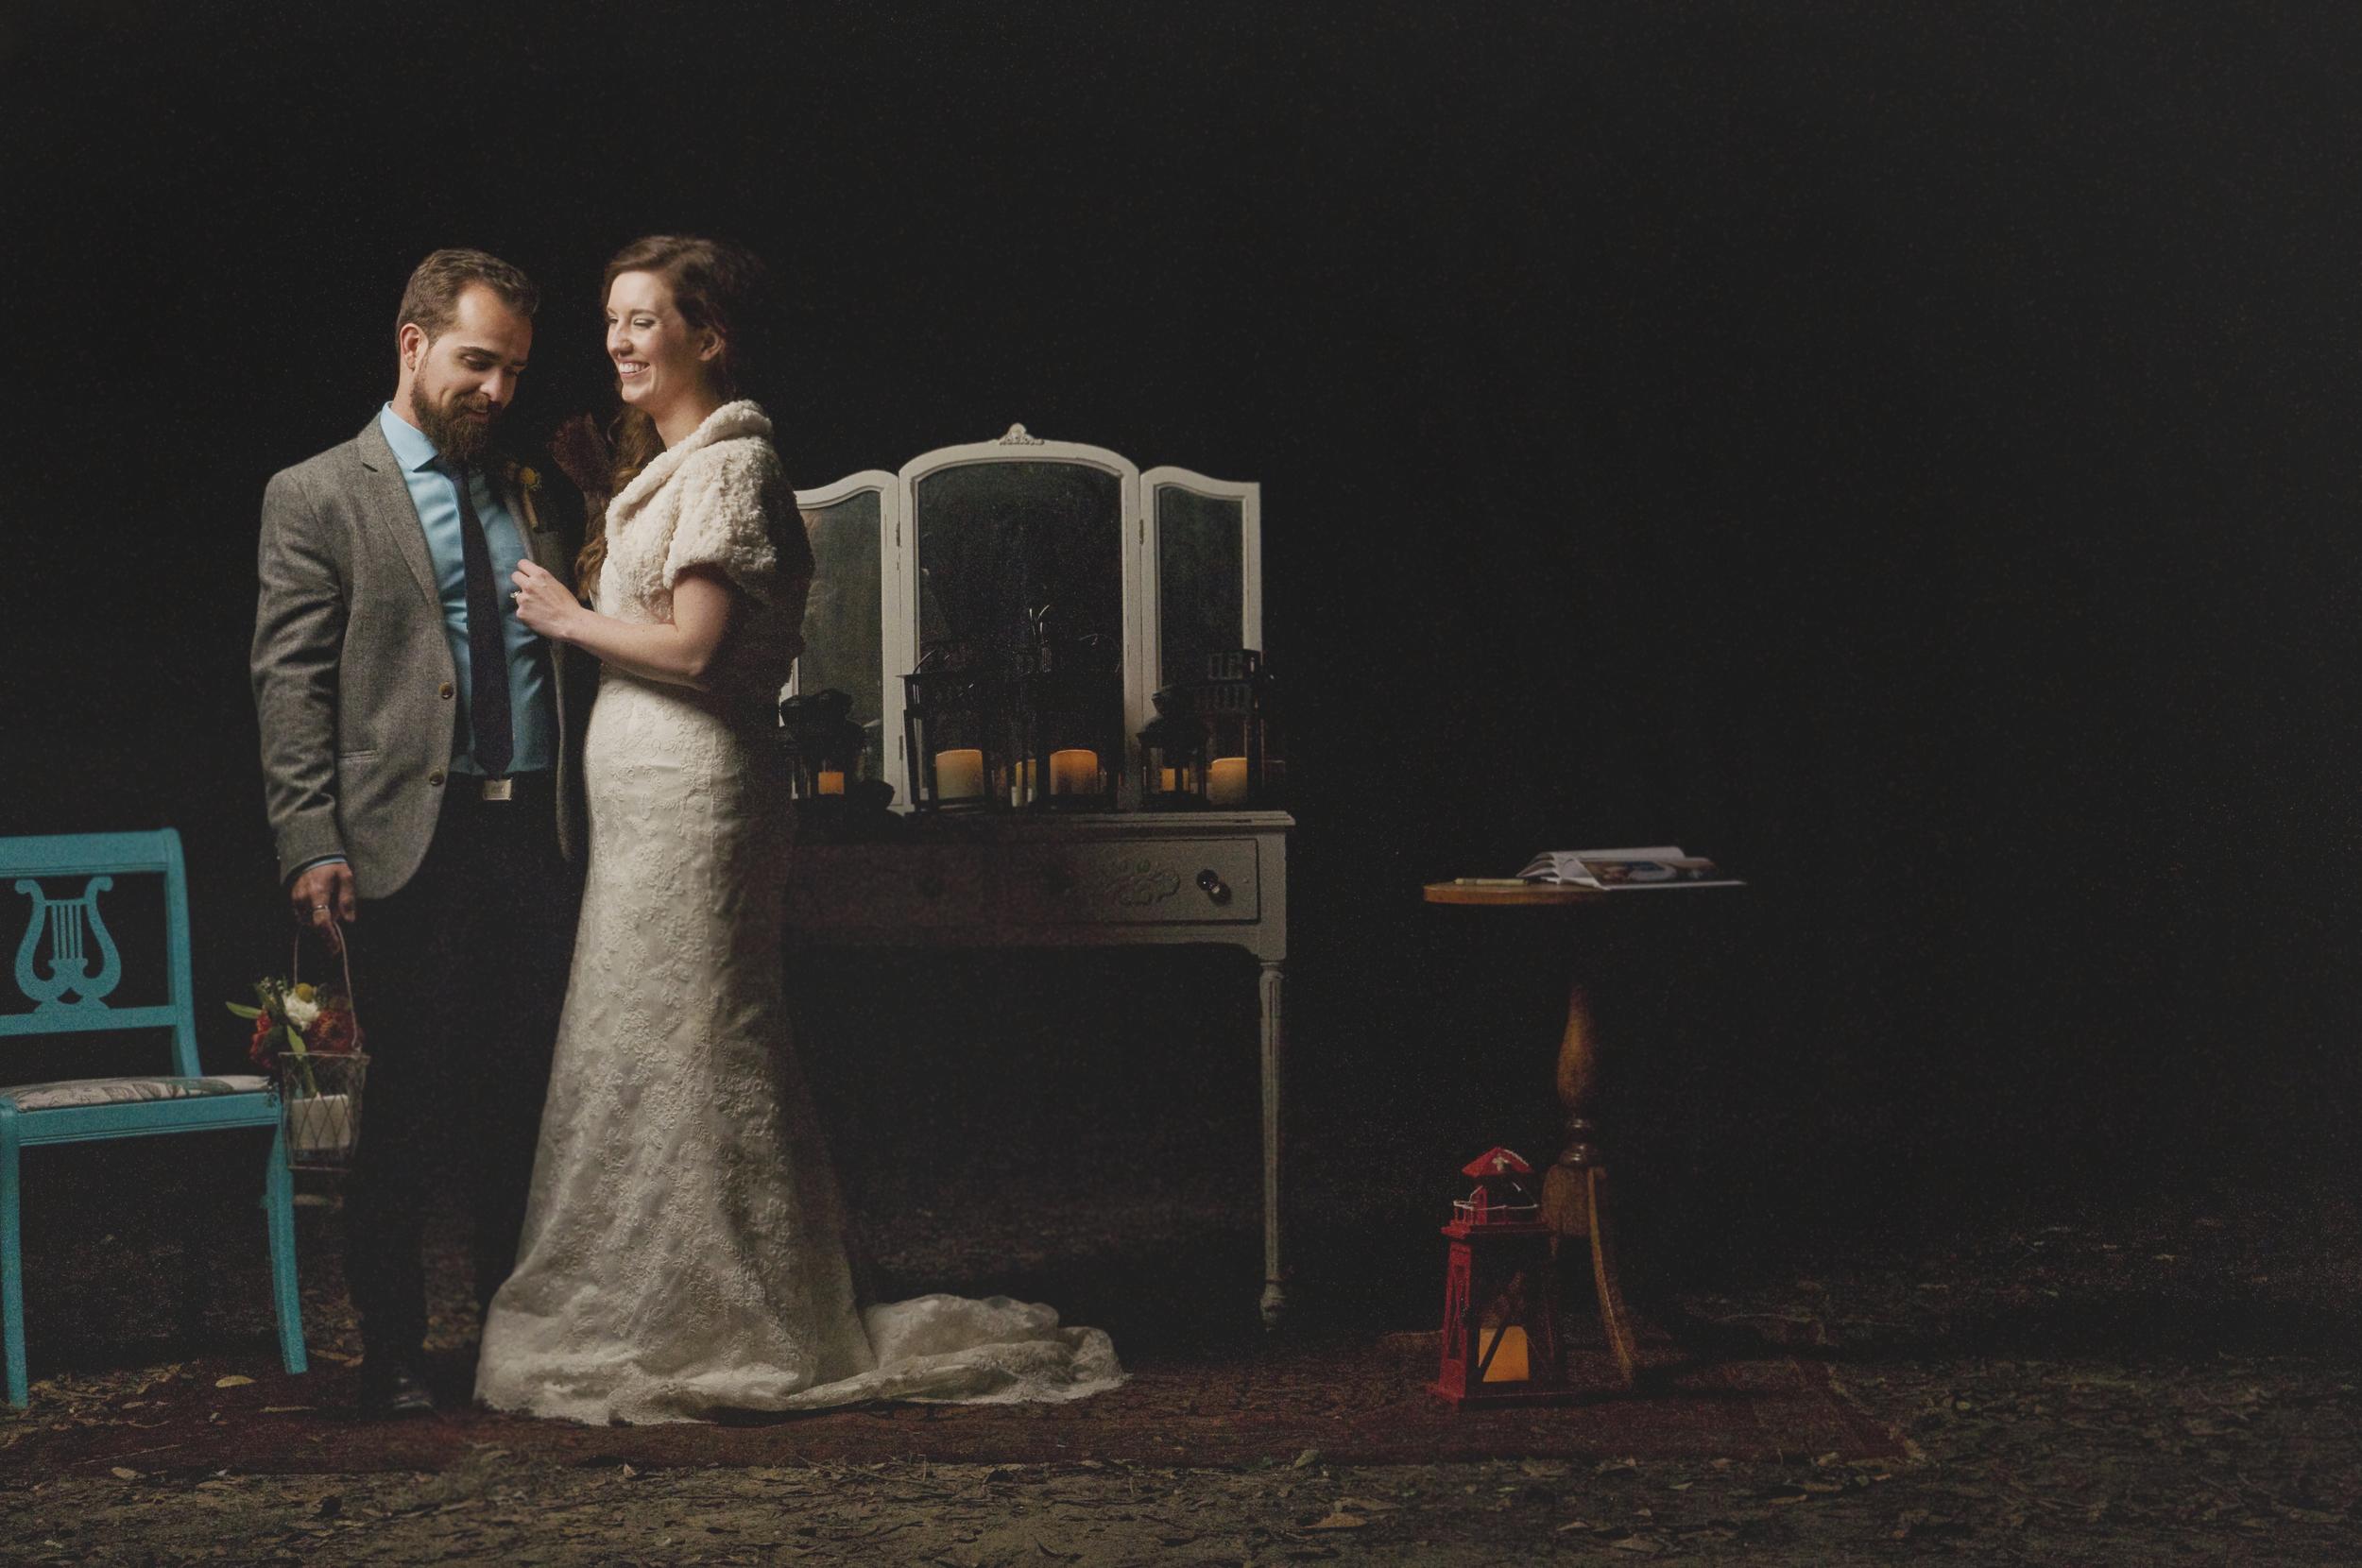 amber-and-david-ivory-and-beau-bridal-boutique-lytle-foto-savannah-wedding-dresses-savannah-wedding-planner-savannah-event-designer-savannah-weddings-wormsloe-wedding-cohens-retreat-wedding-indie-wedding-handmade-wedding-historic-32.jpg